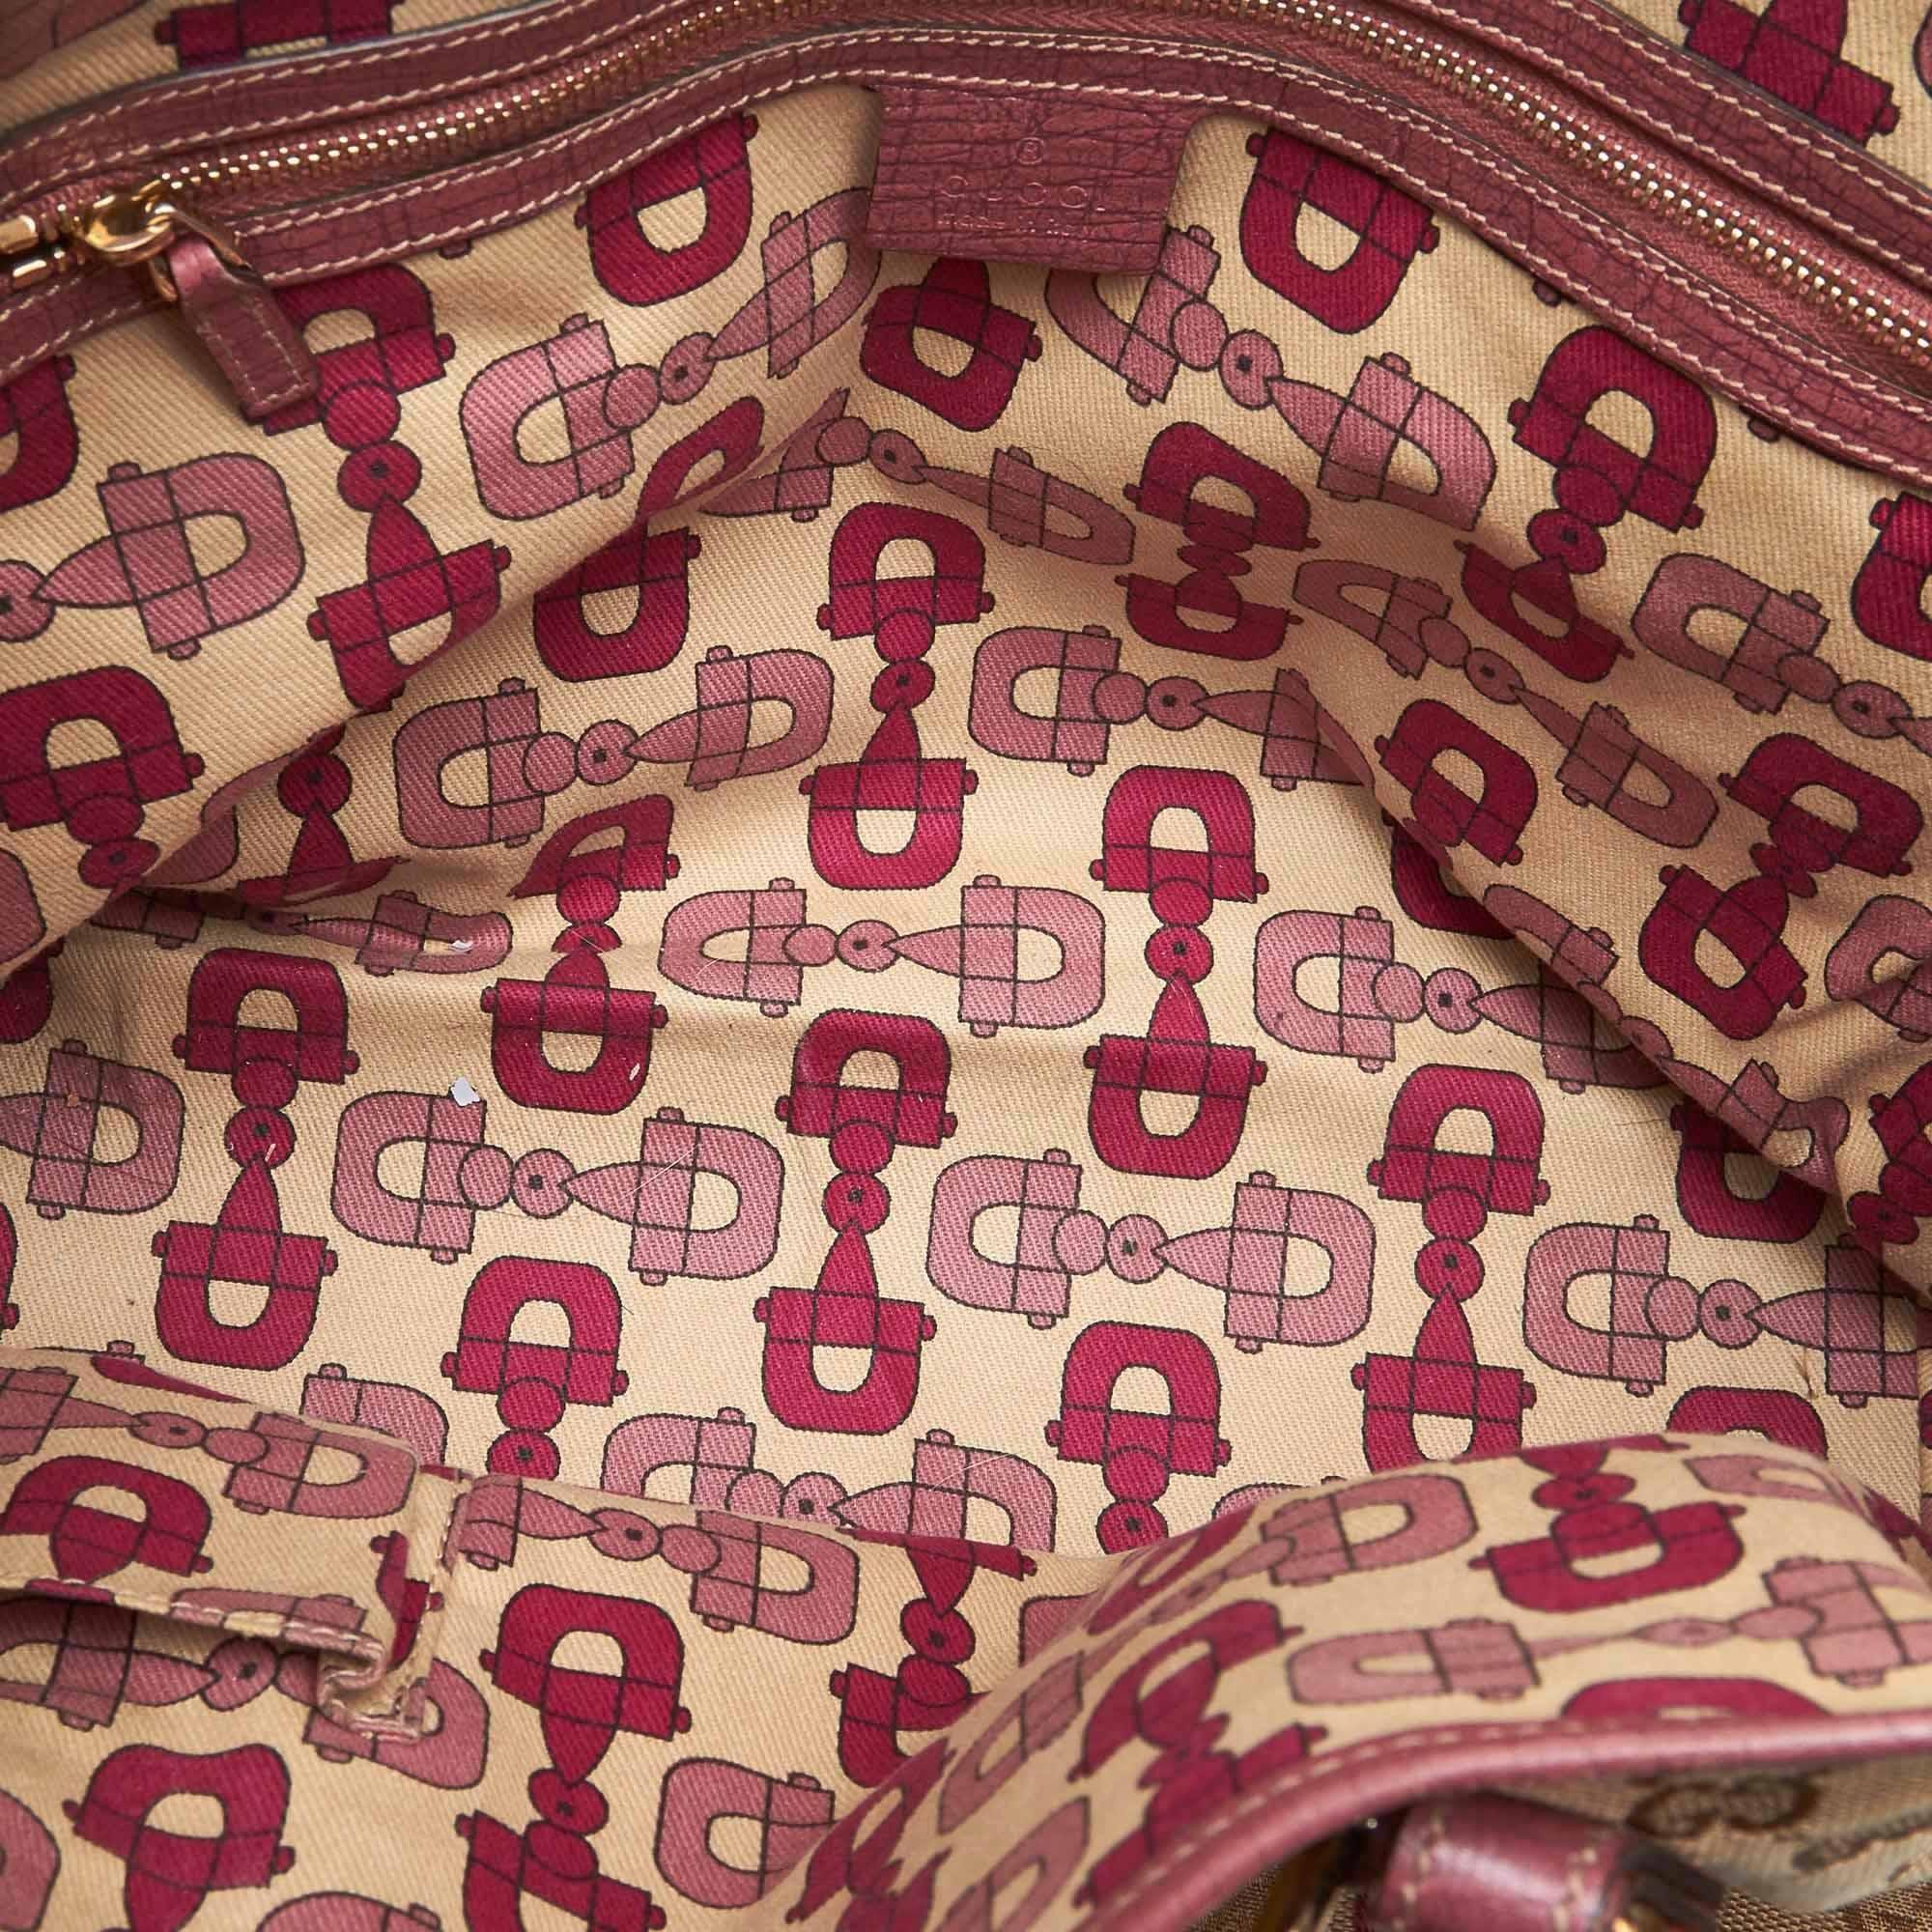 e907f34ce7c2 Gucci Brown GG Jacquard Jolicoeur Tote Bag at 1stdibs